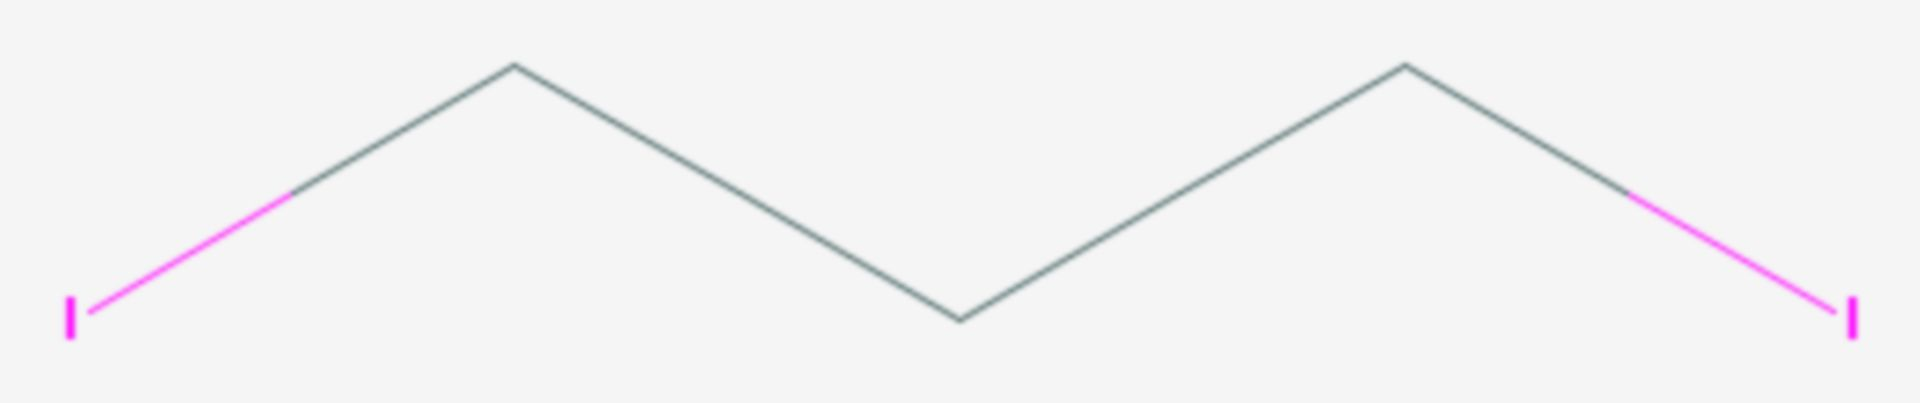 1,3-Diiodpropan (Strukturformel)